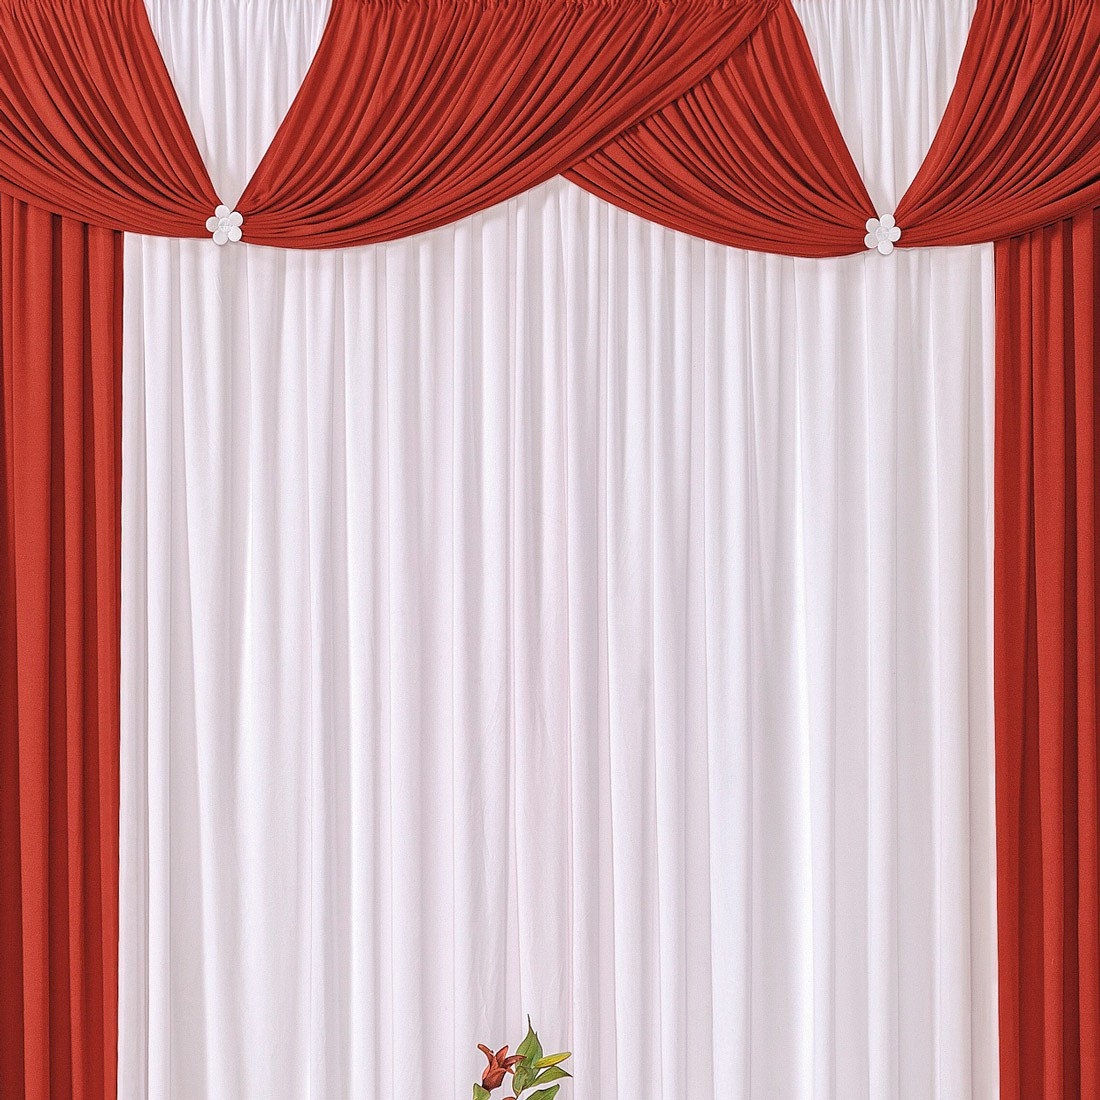 Cortina Londrina Vermelho/Branco 4,00m X 2,60m p/ Varão Simples